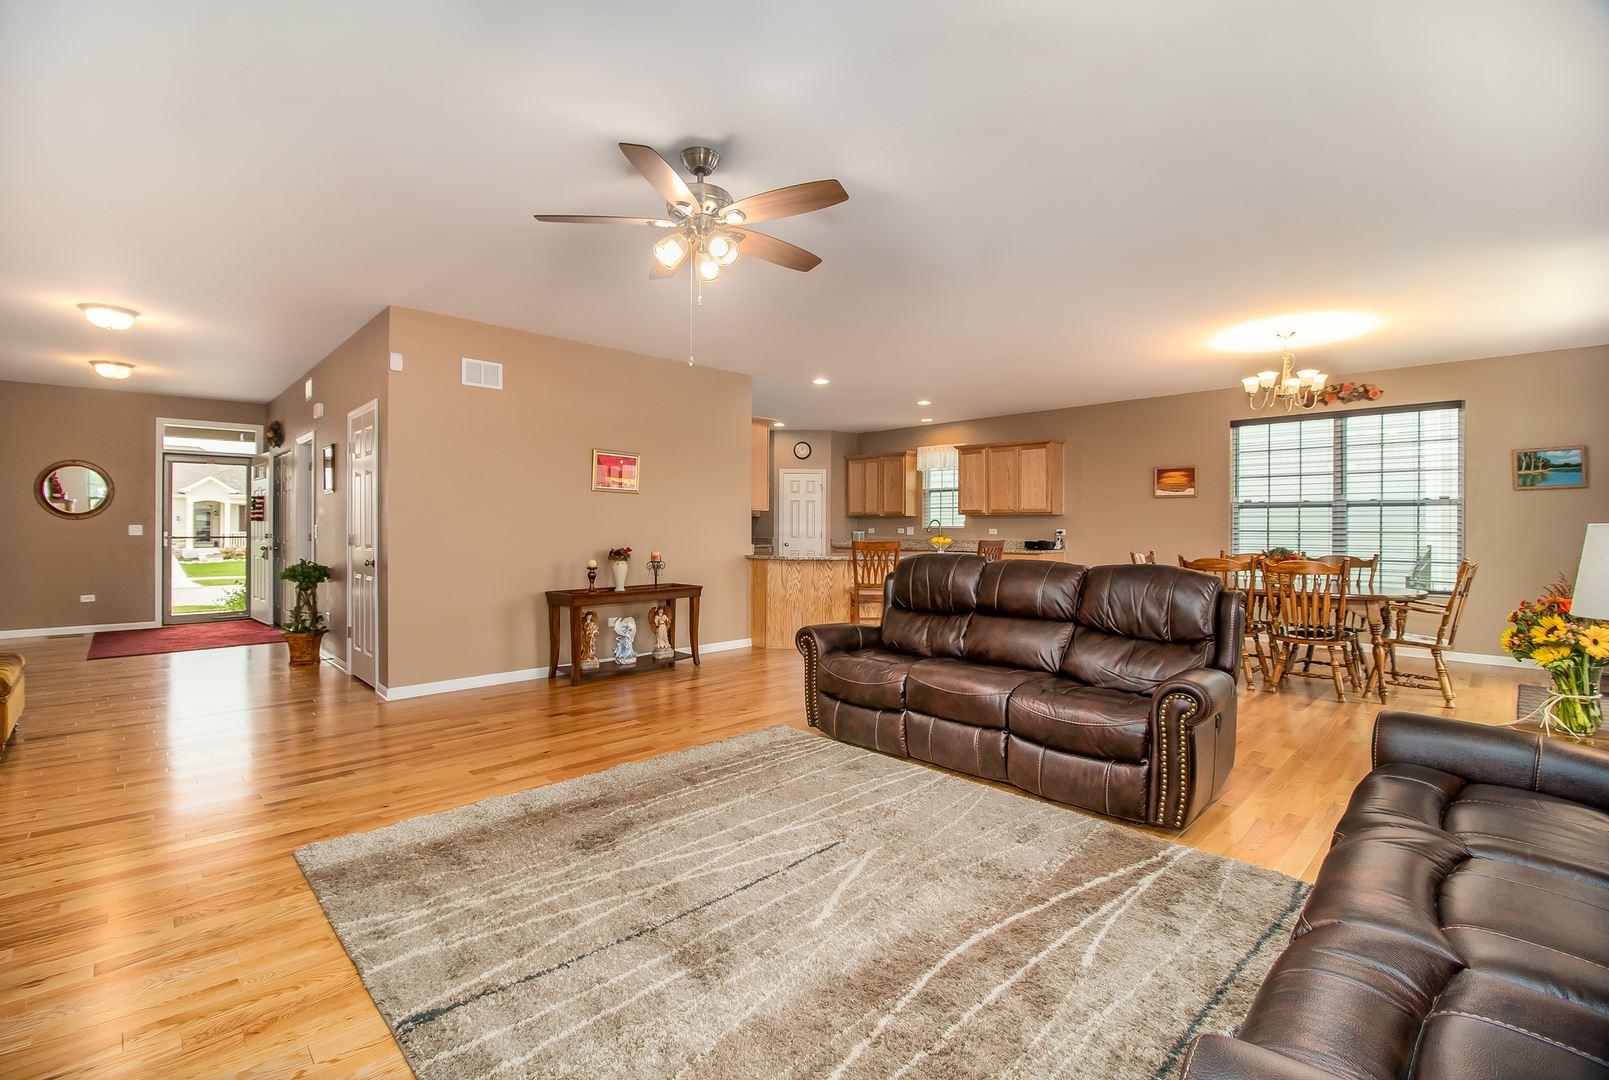 Photo of 1614 Metcalf Lane, Shorewood, IL 60404 (MLS # 10883663)